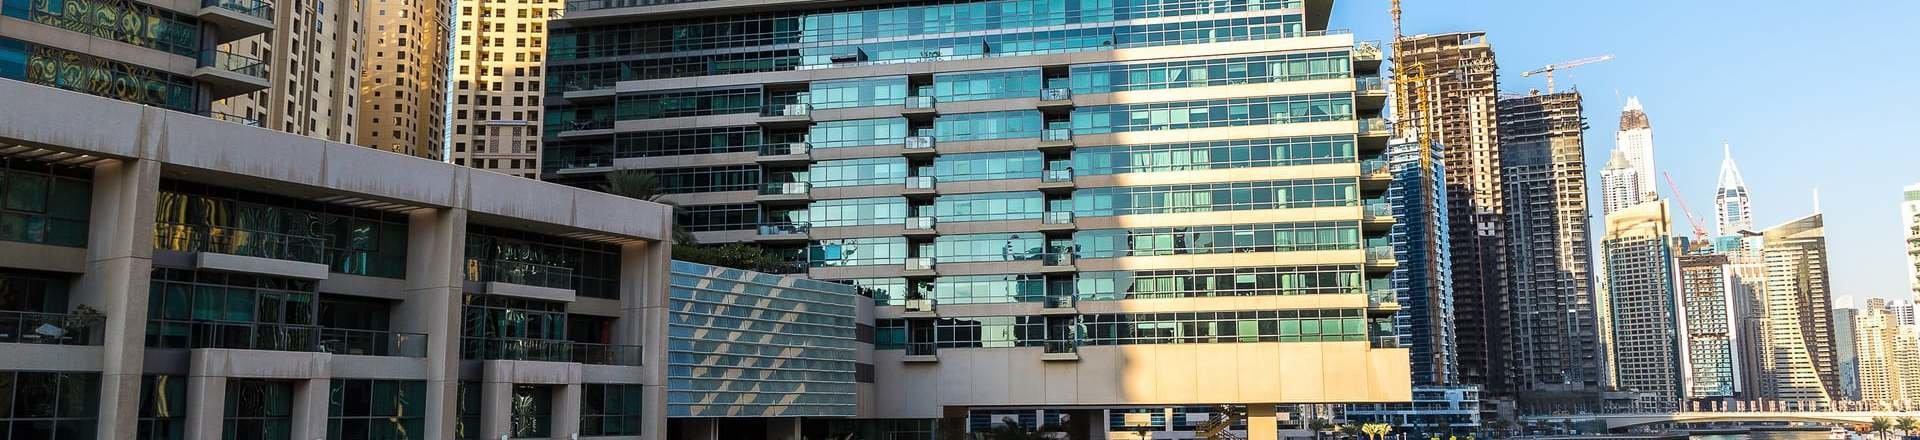 Cheap hotels in dubai from 22 for 3 star hotels in dubai